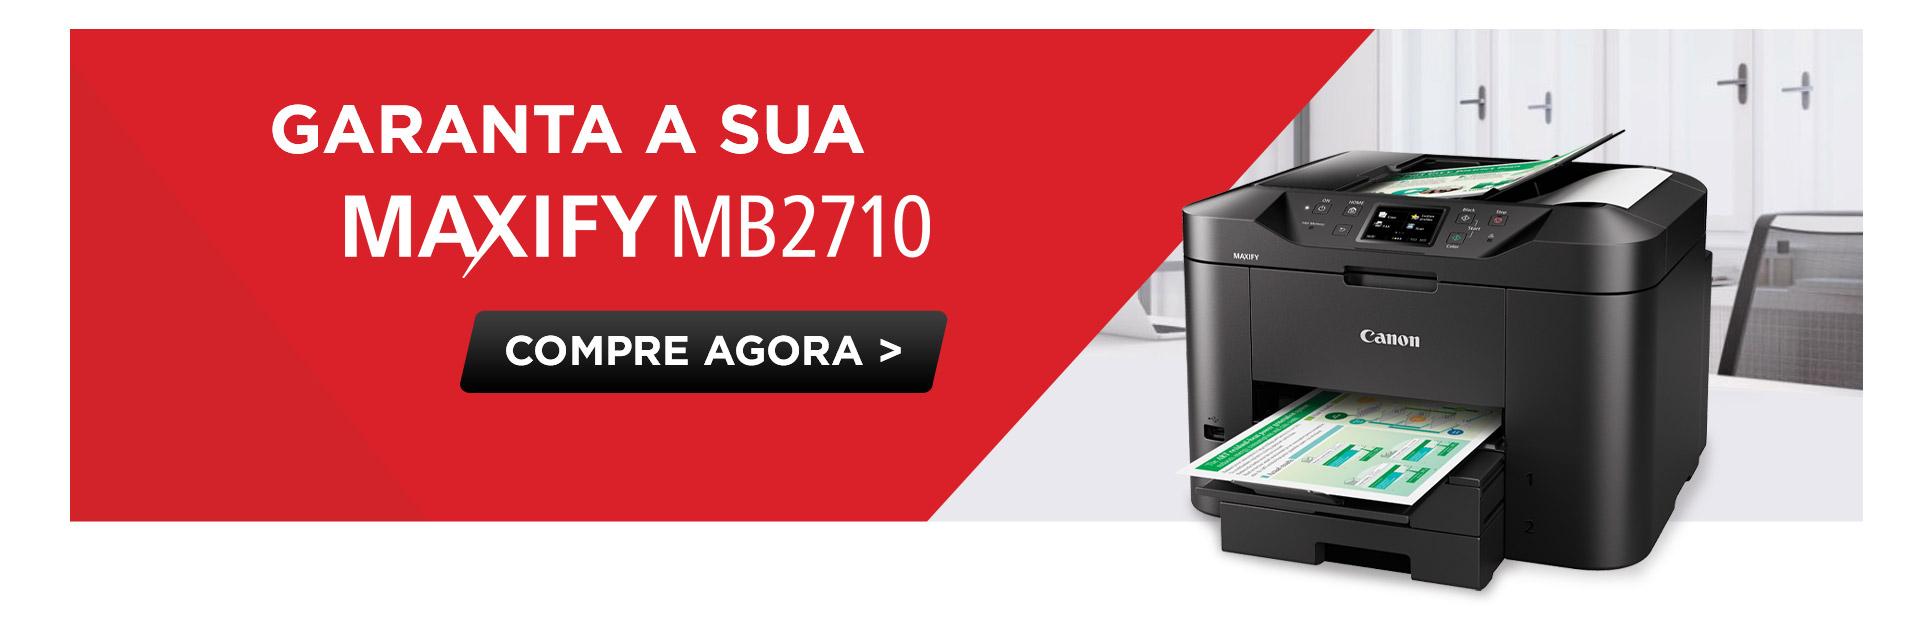 Impressora Multifuncional MAXIFY MB2710